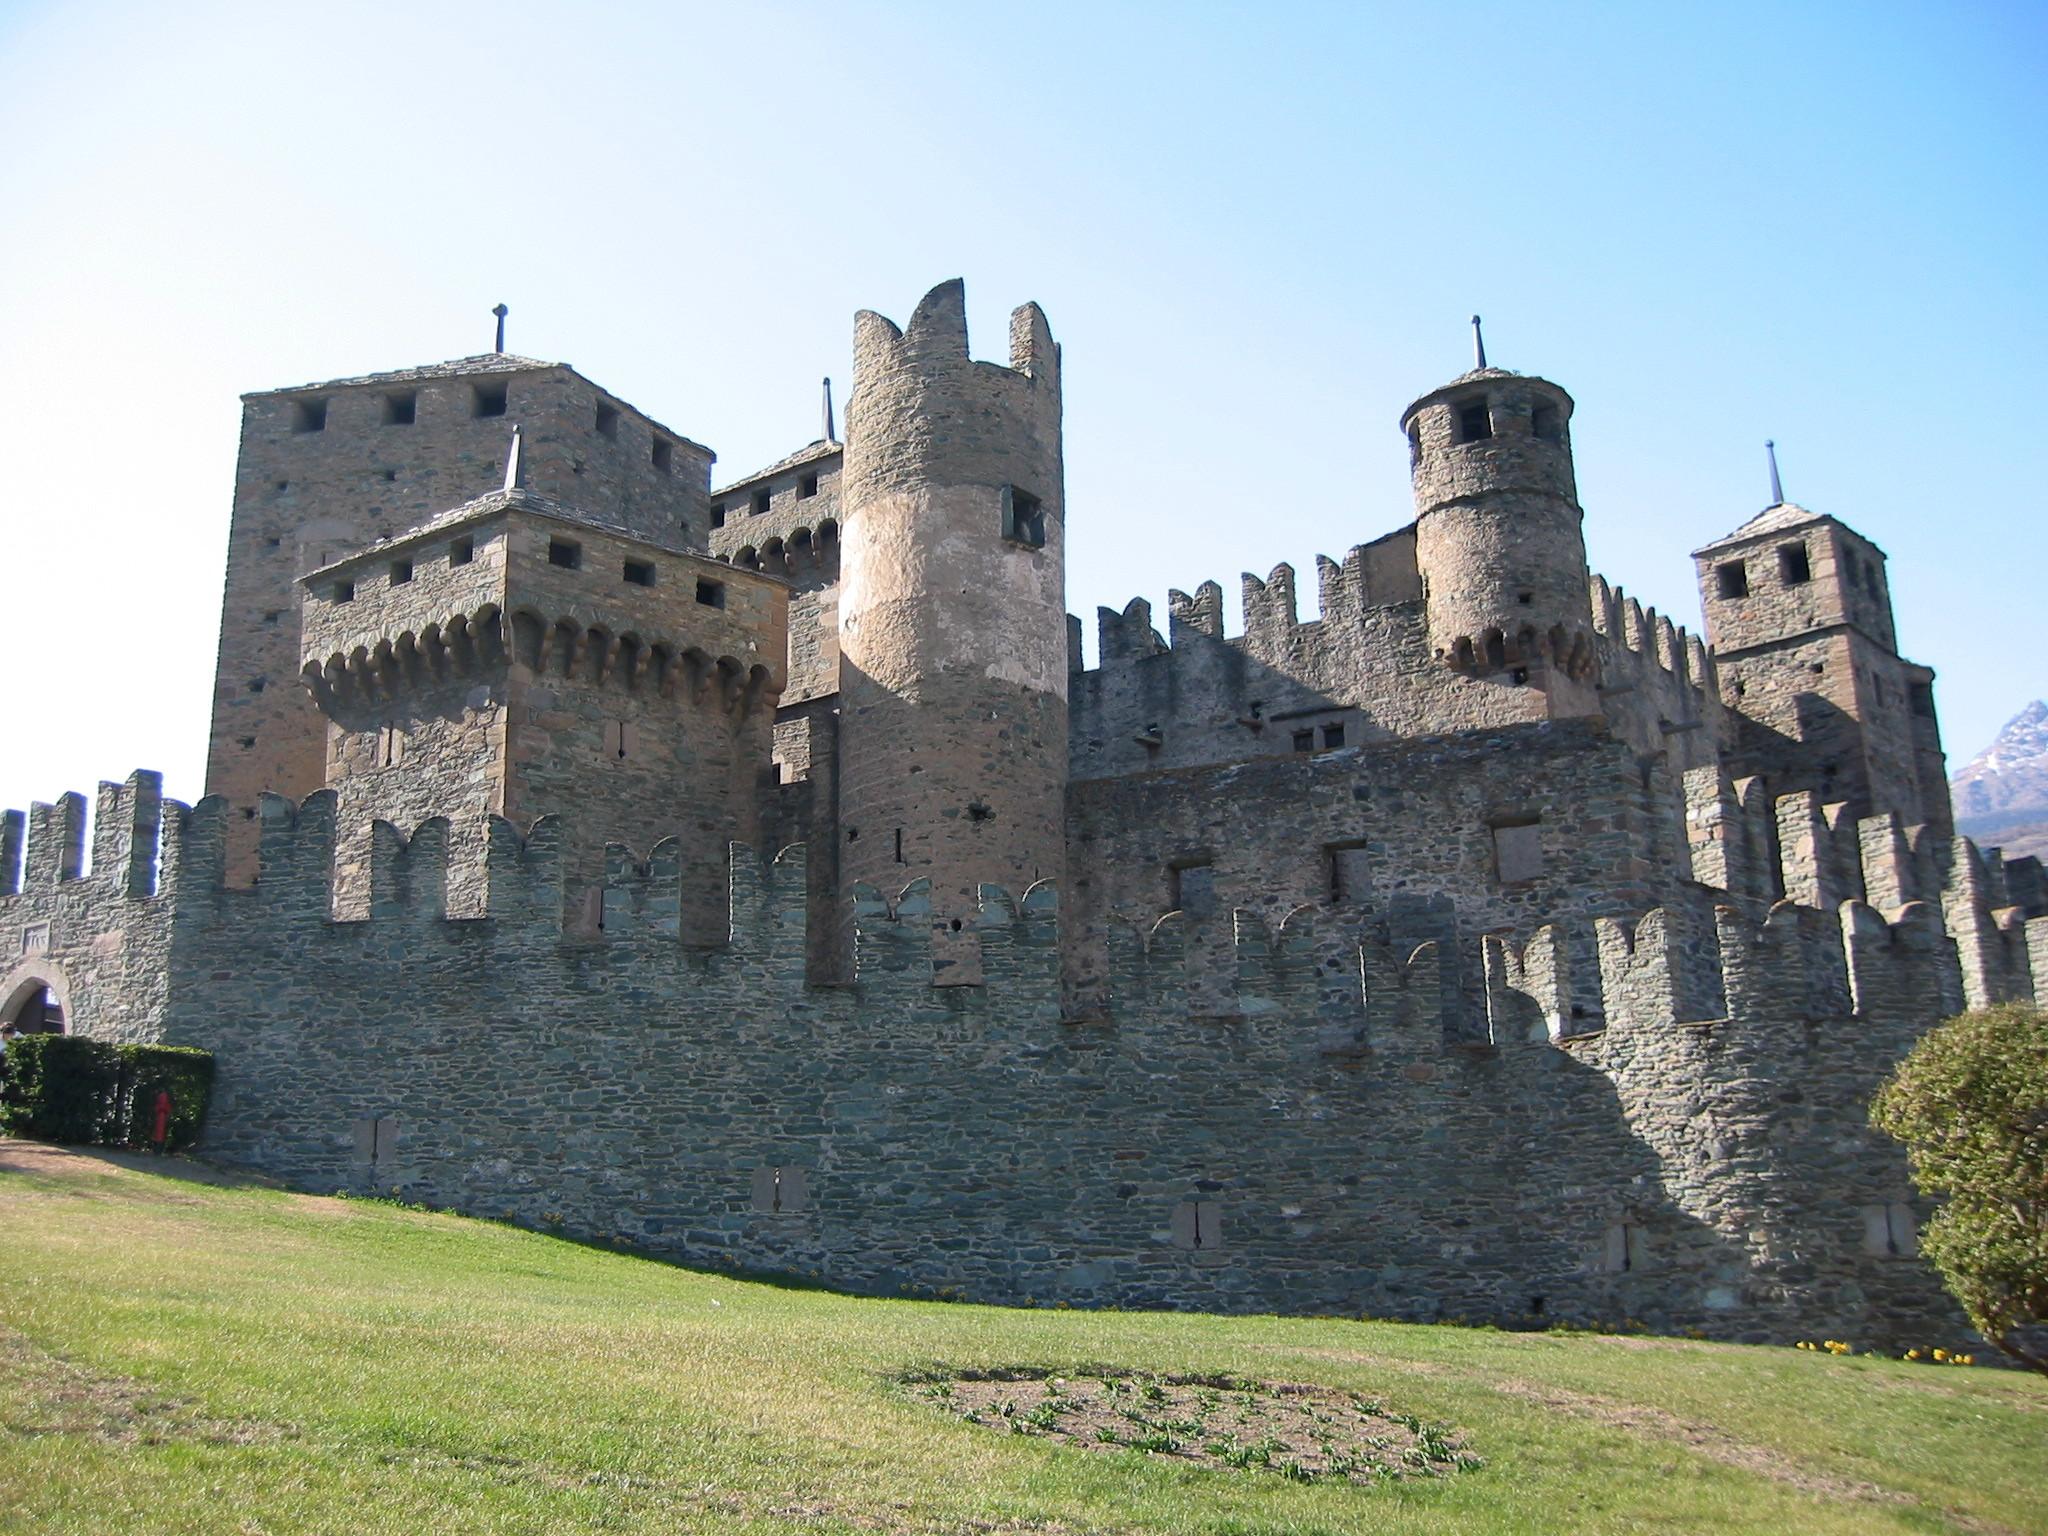 File:Castello Fénis.jpg - Wikimedia Commons